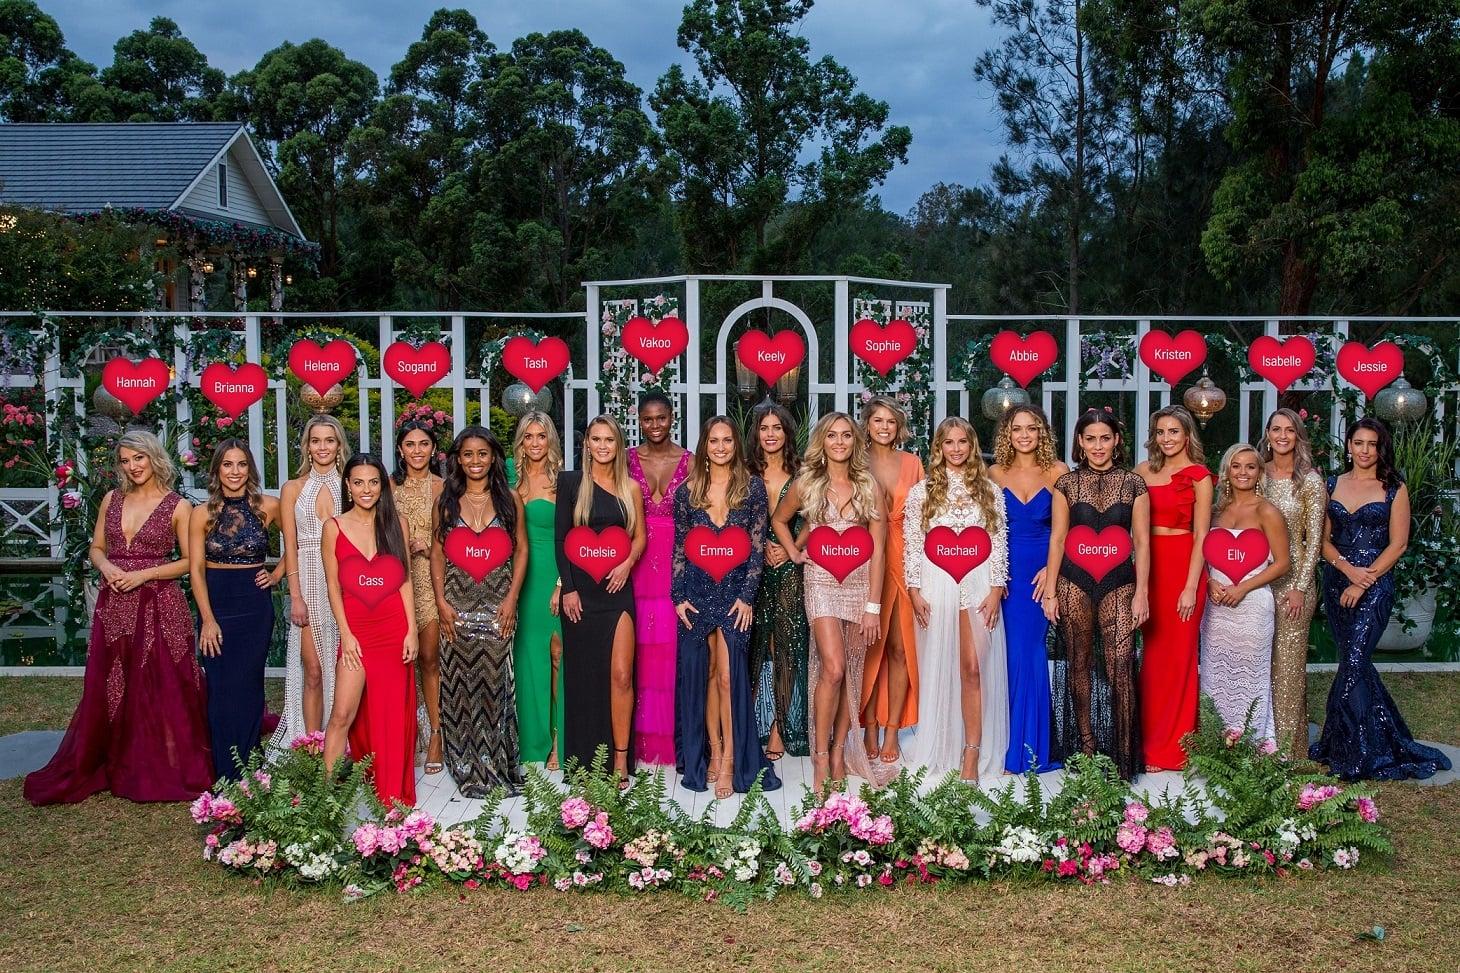 The Bachelor reveals 2019 Bachelorettes